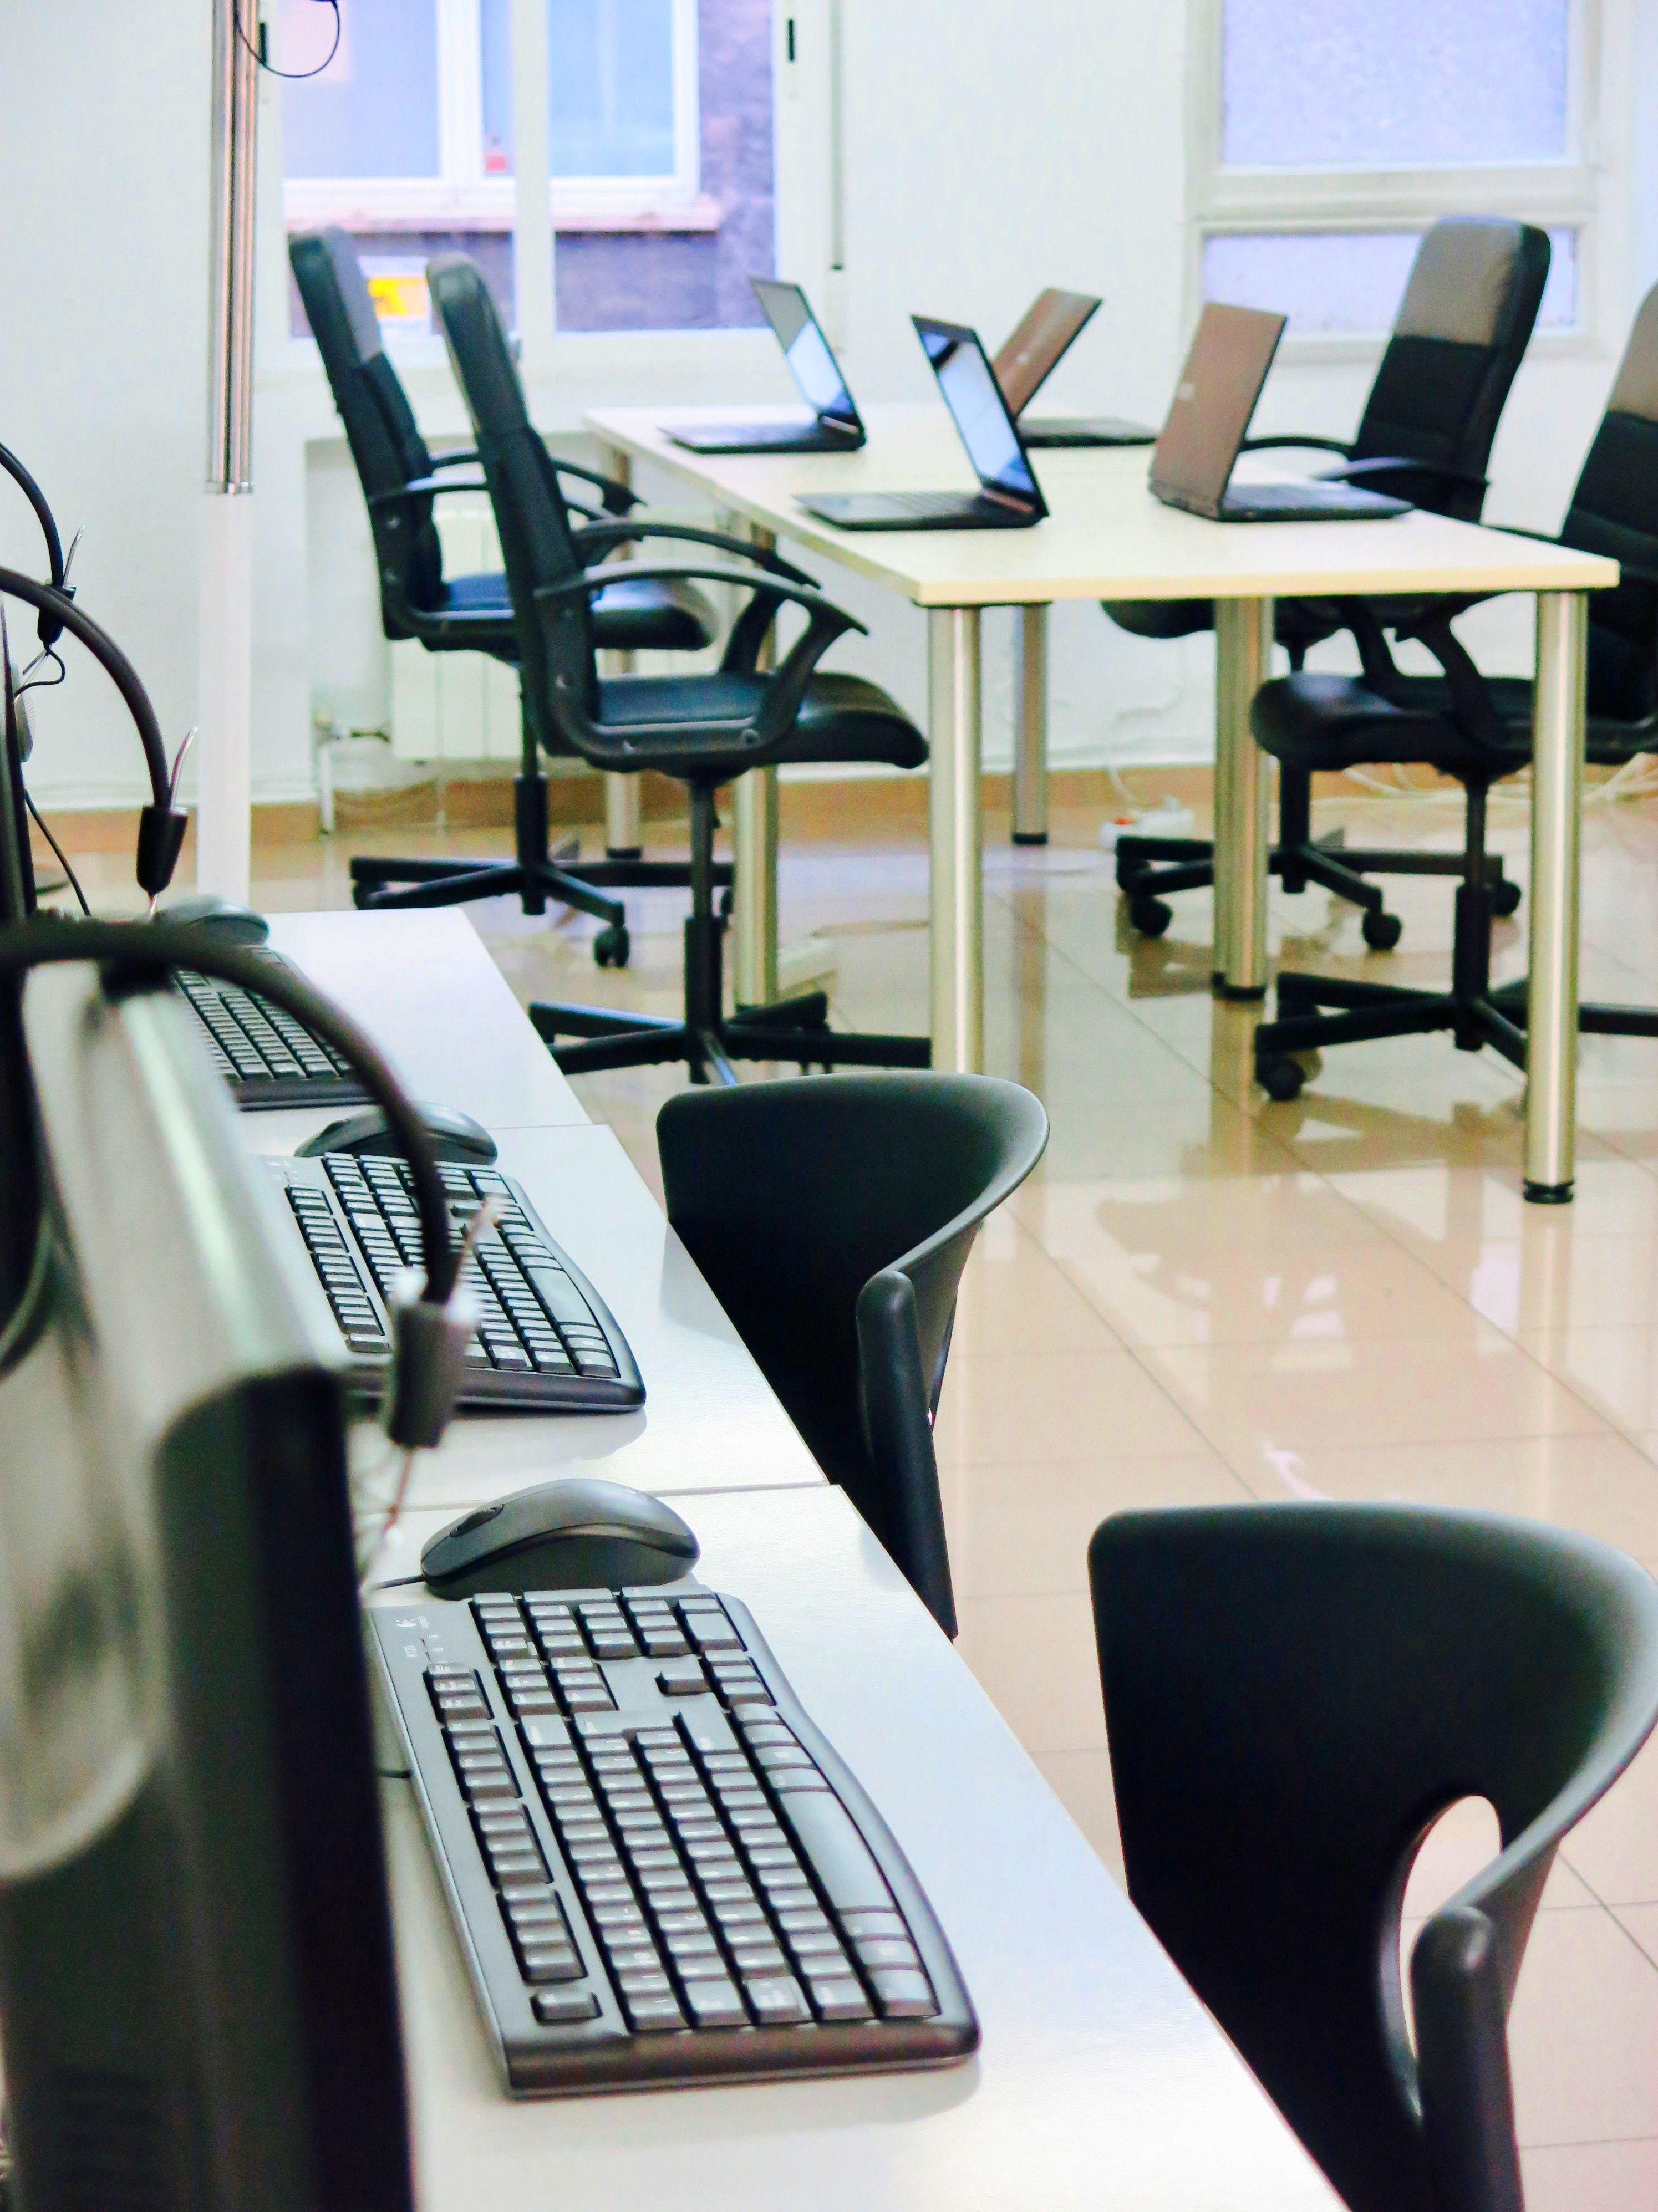 Foto 5 de Academias de informática en Madrid | meca-rapid Felipe II